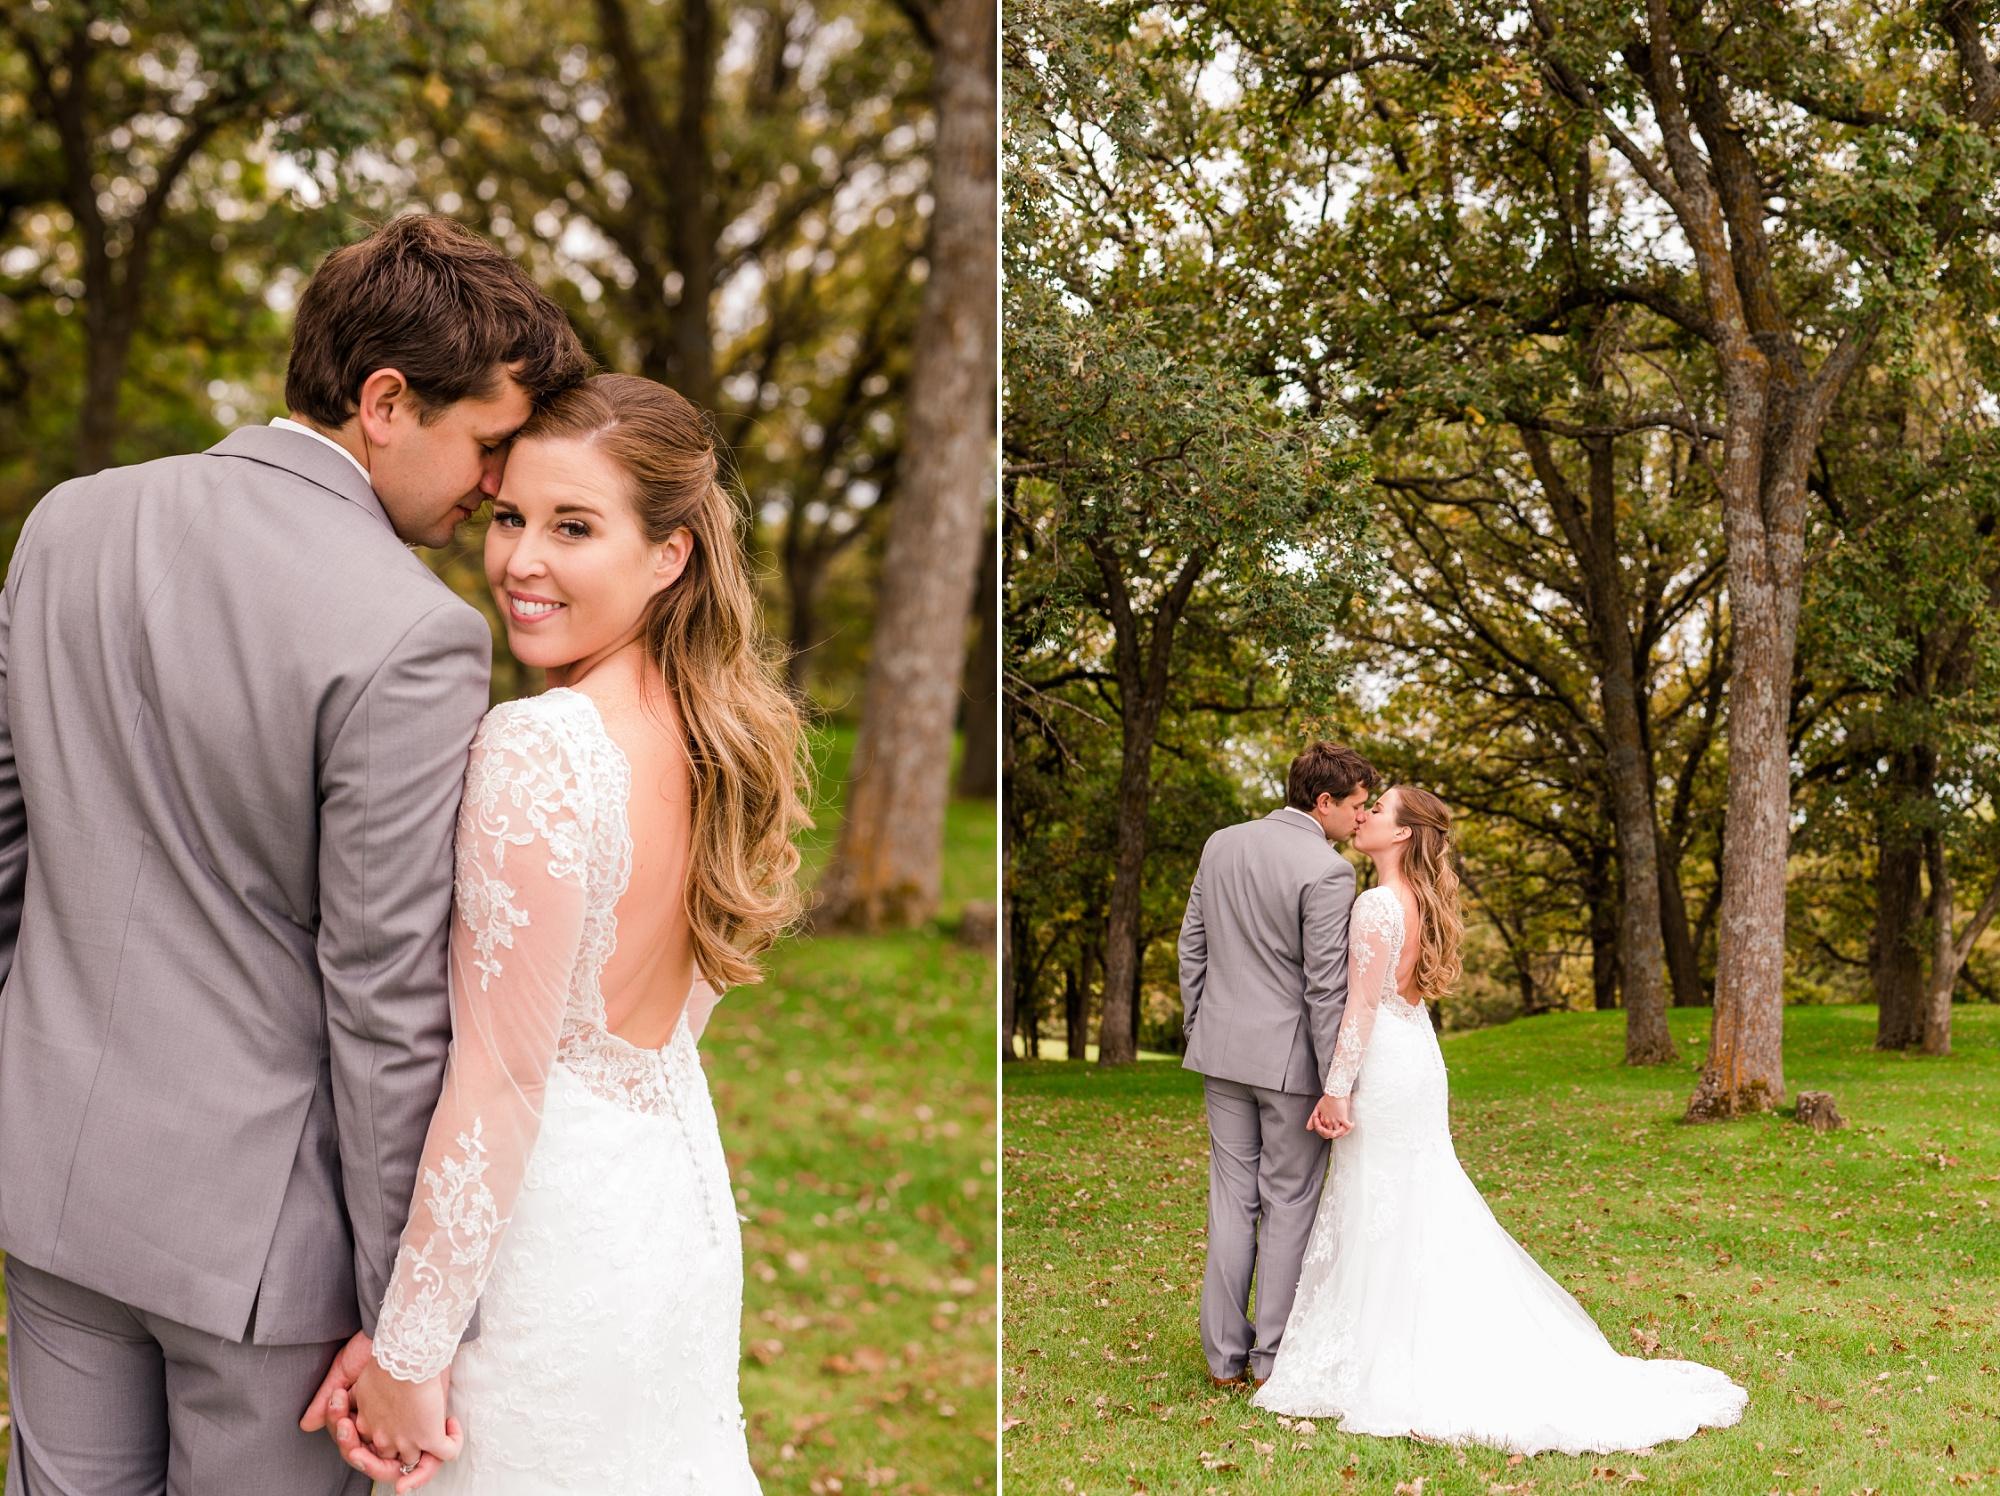 AmberLangerudPhotography_Fair Hills Resort Lakeside Wedding in Minnesota_3441.jpg